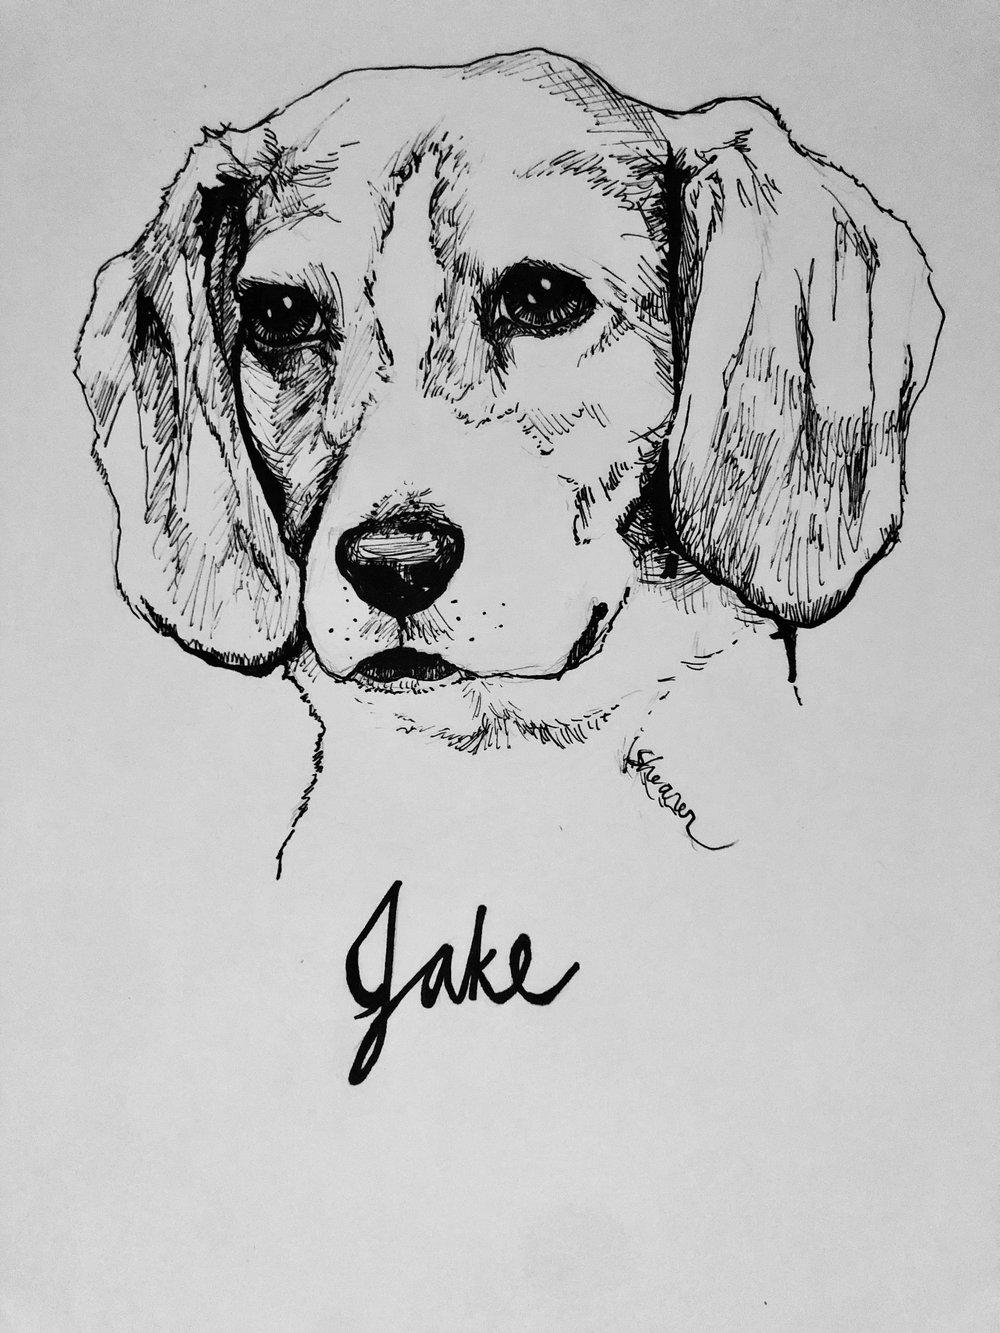 JakeBeagleSketch.jpeg